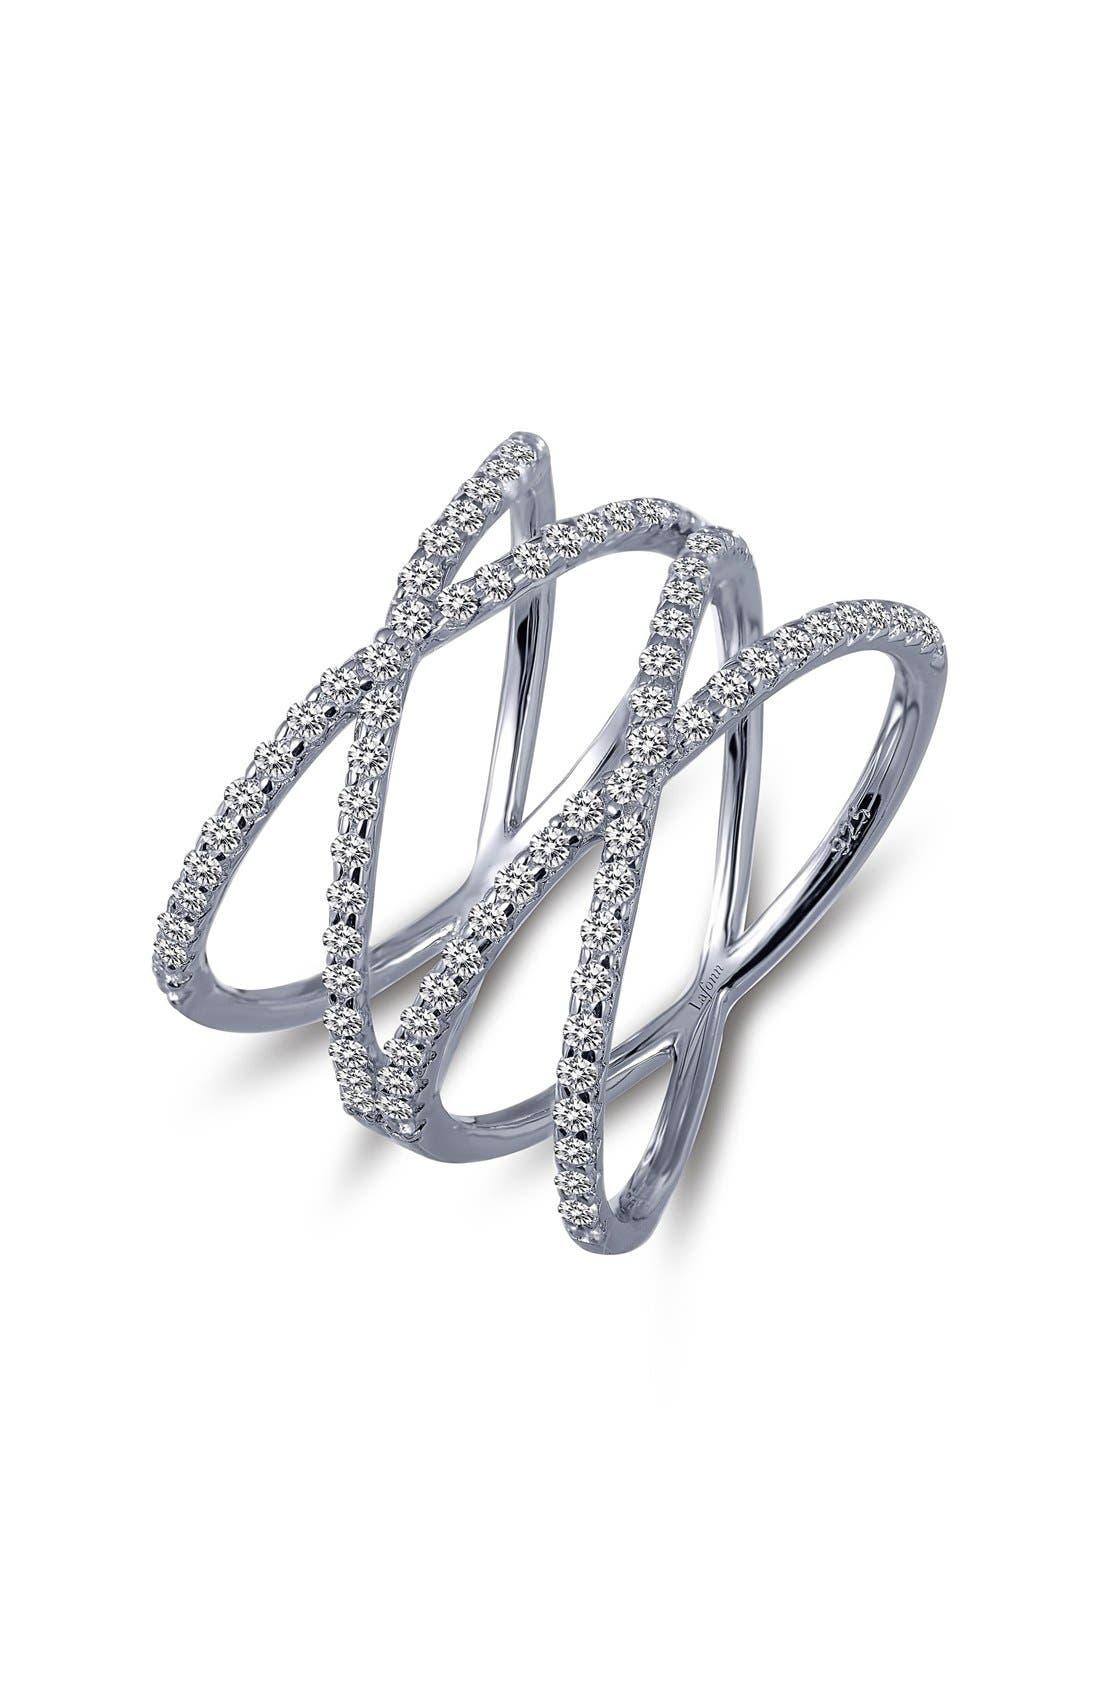 Main Image - Lafonn Double Crisscross Ring